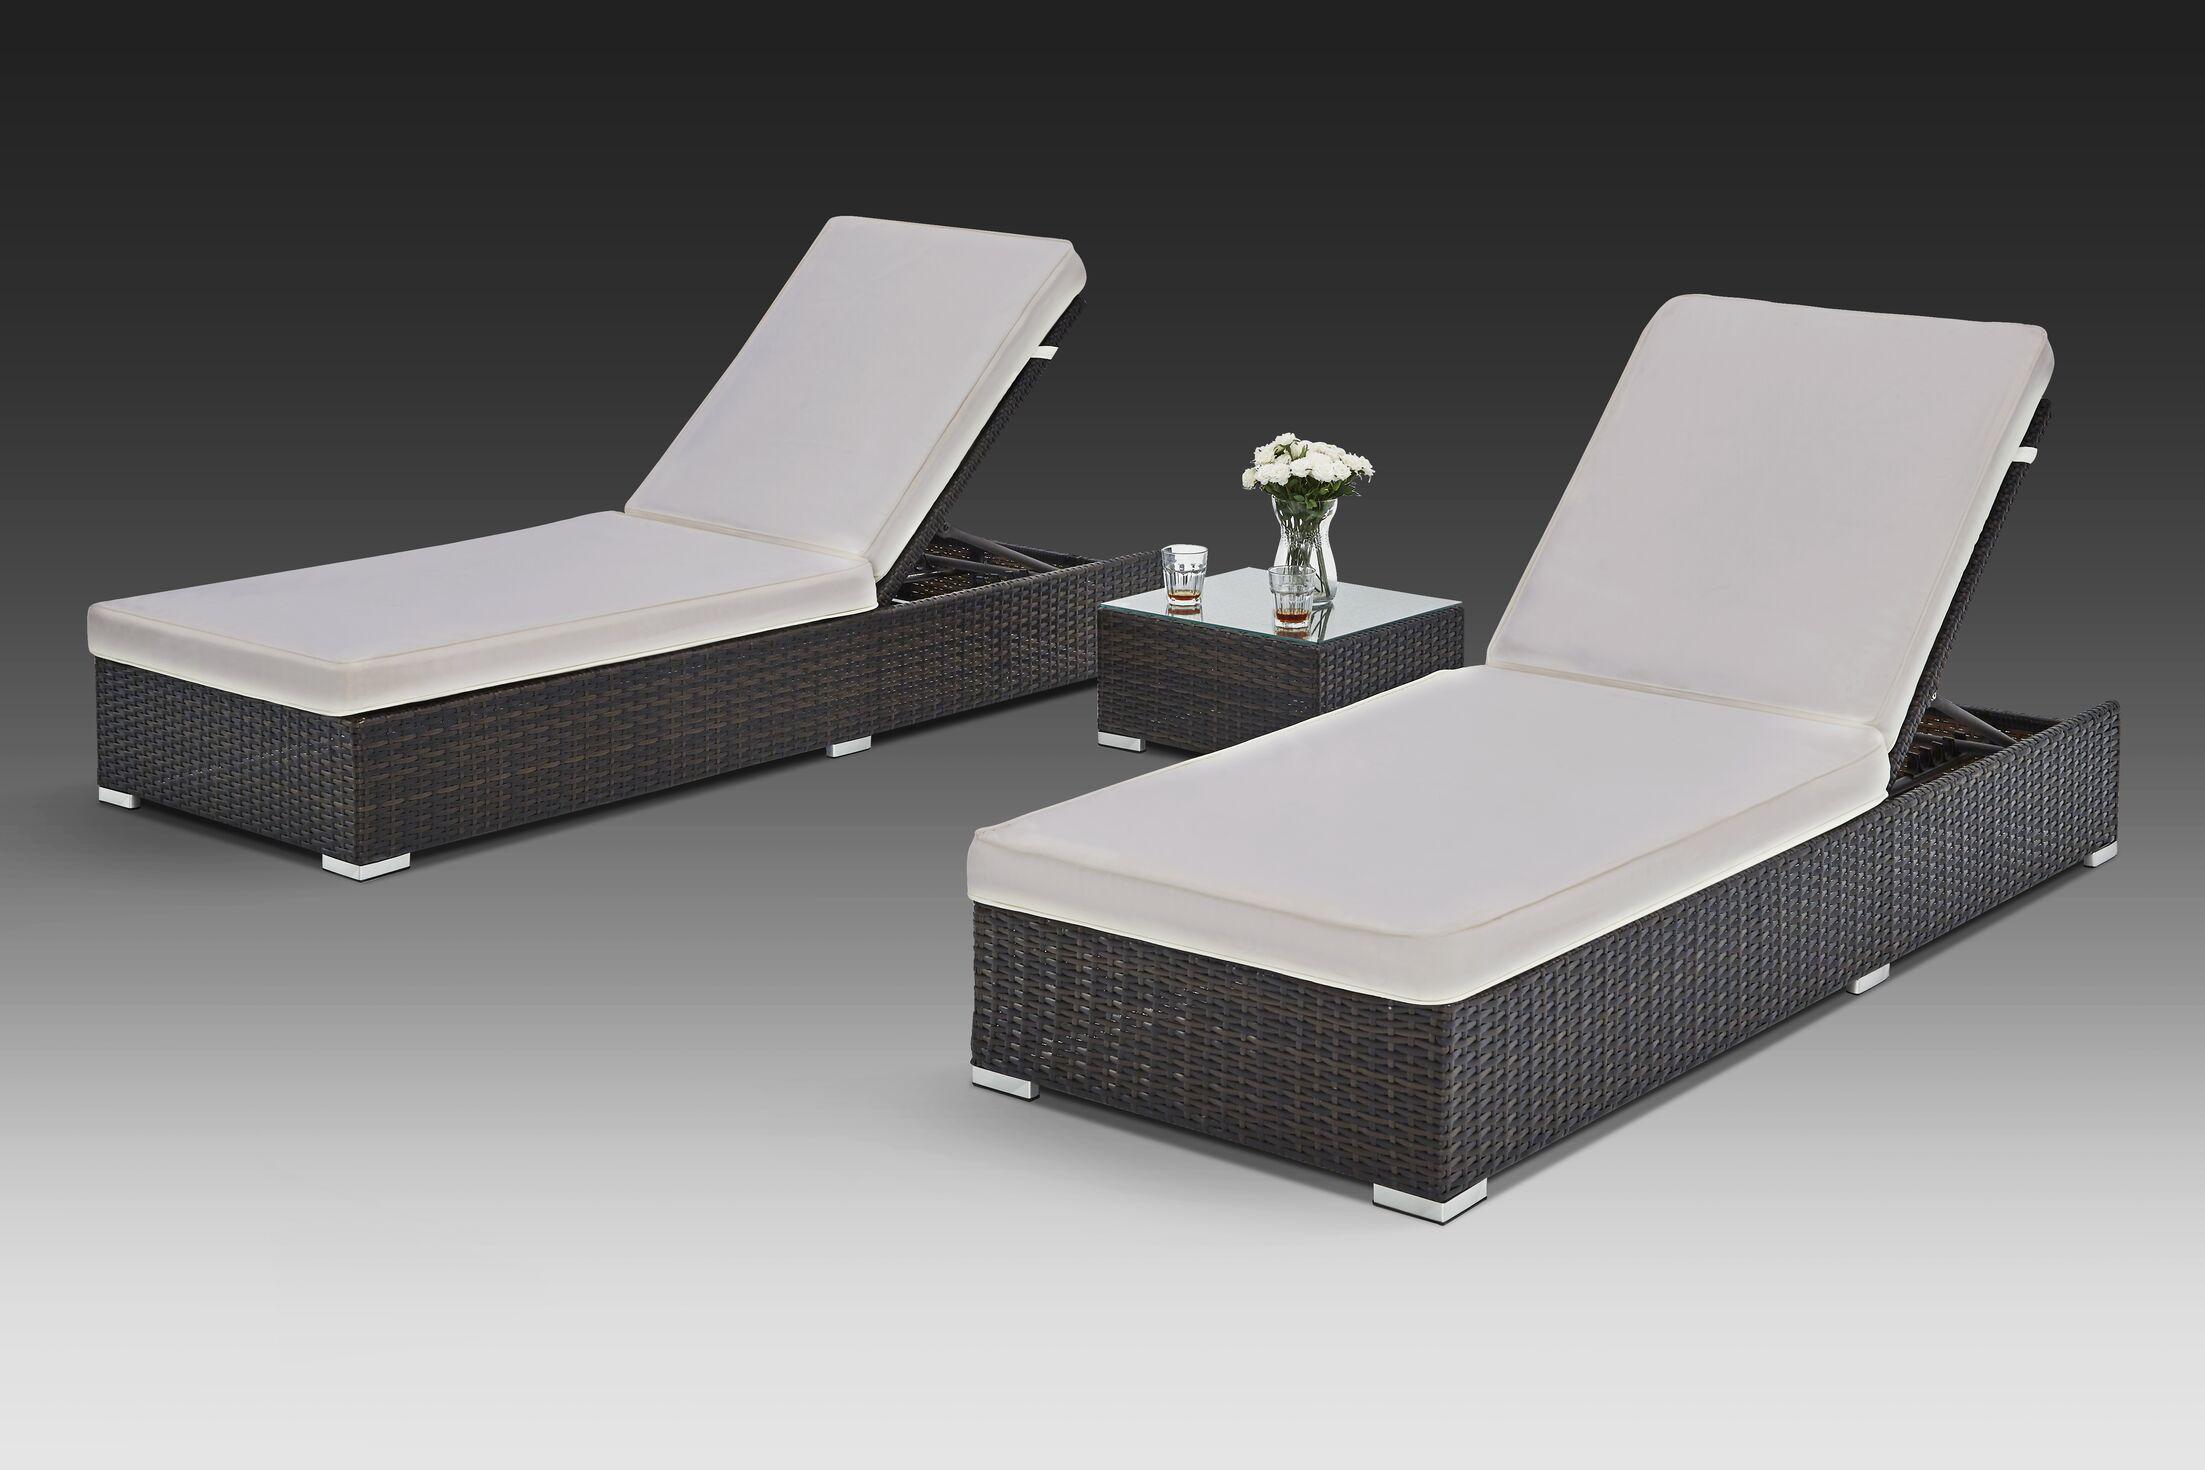 Putney 3 Piece Chaise Lounge Set